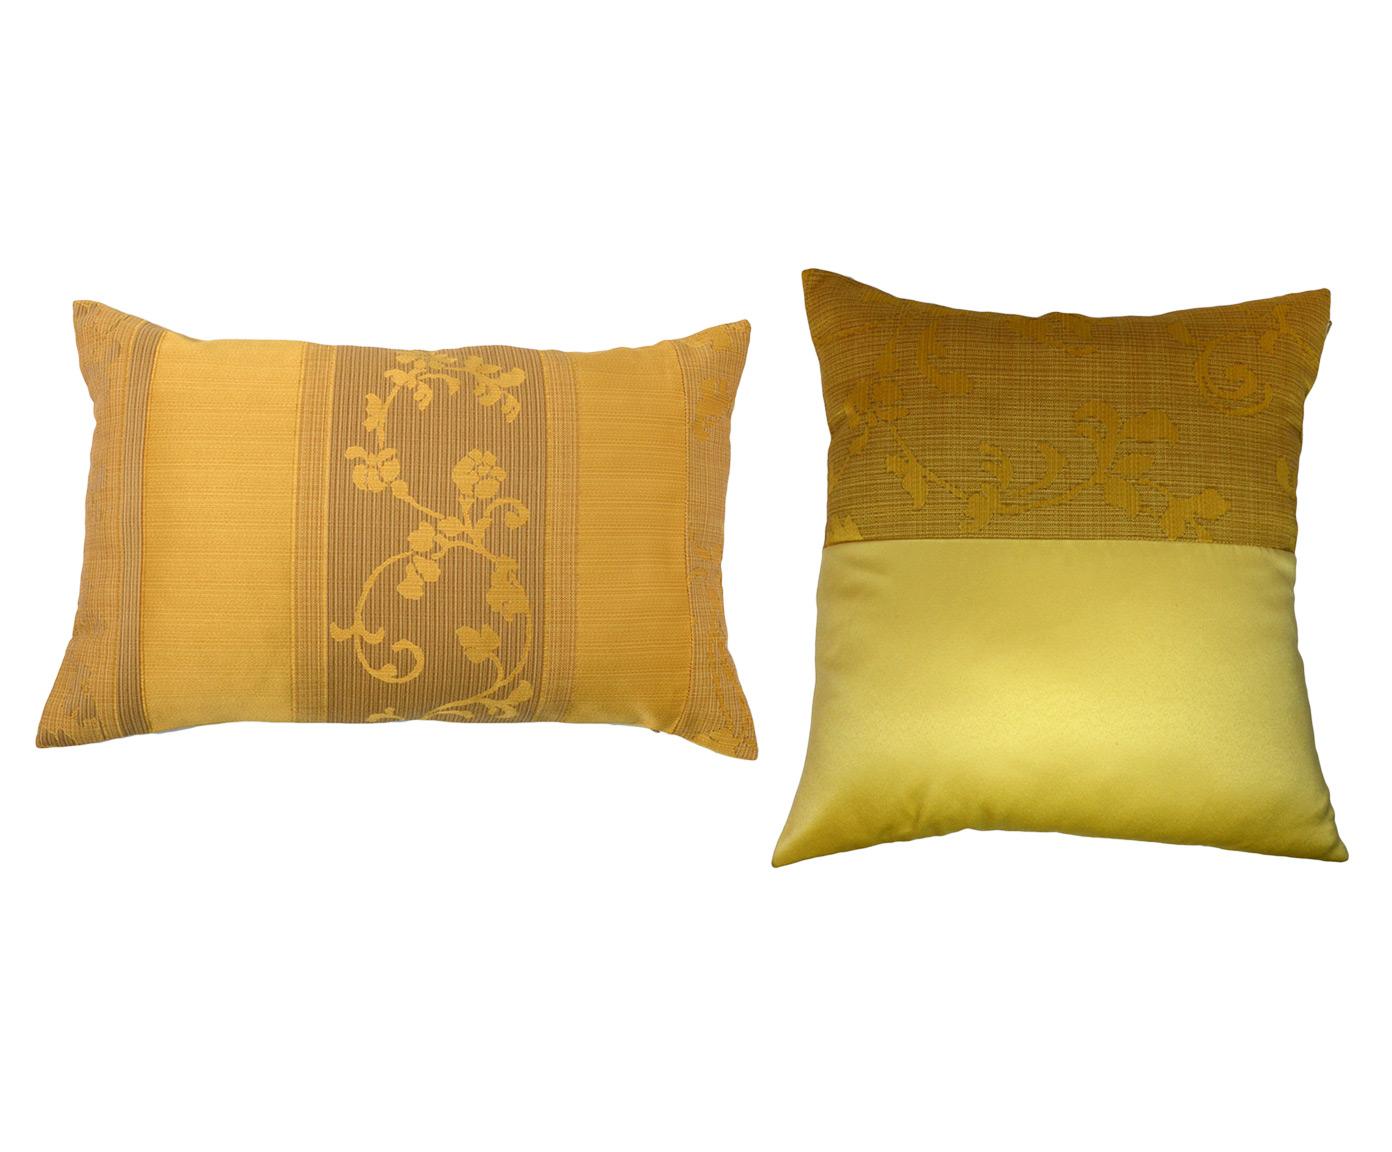 Комплект подушек Tender Sand (2шт)Квадратные подушки и наволочки<br>Комплект декоративных  подушек. Чехол съемный.<br><br>kit: None<br>gender: None